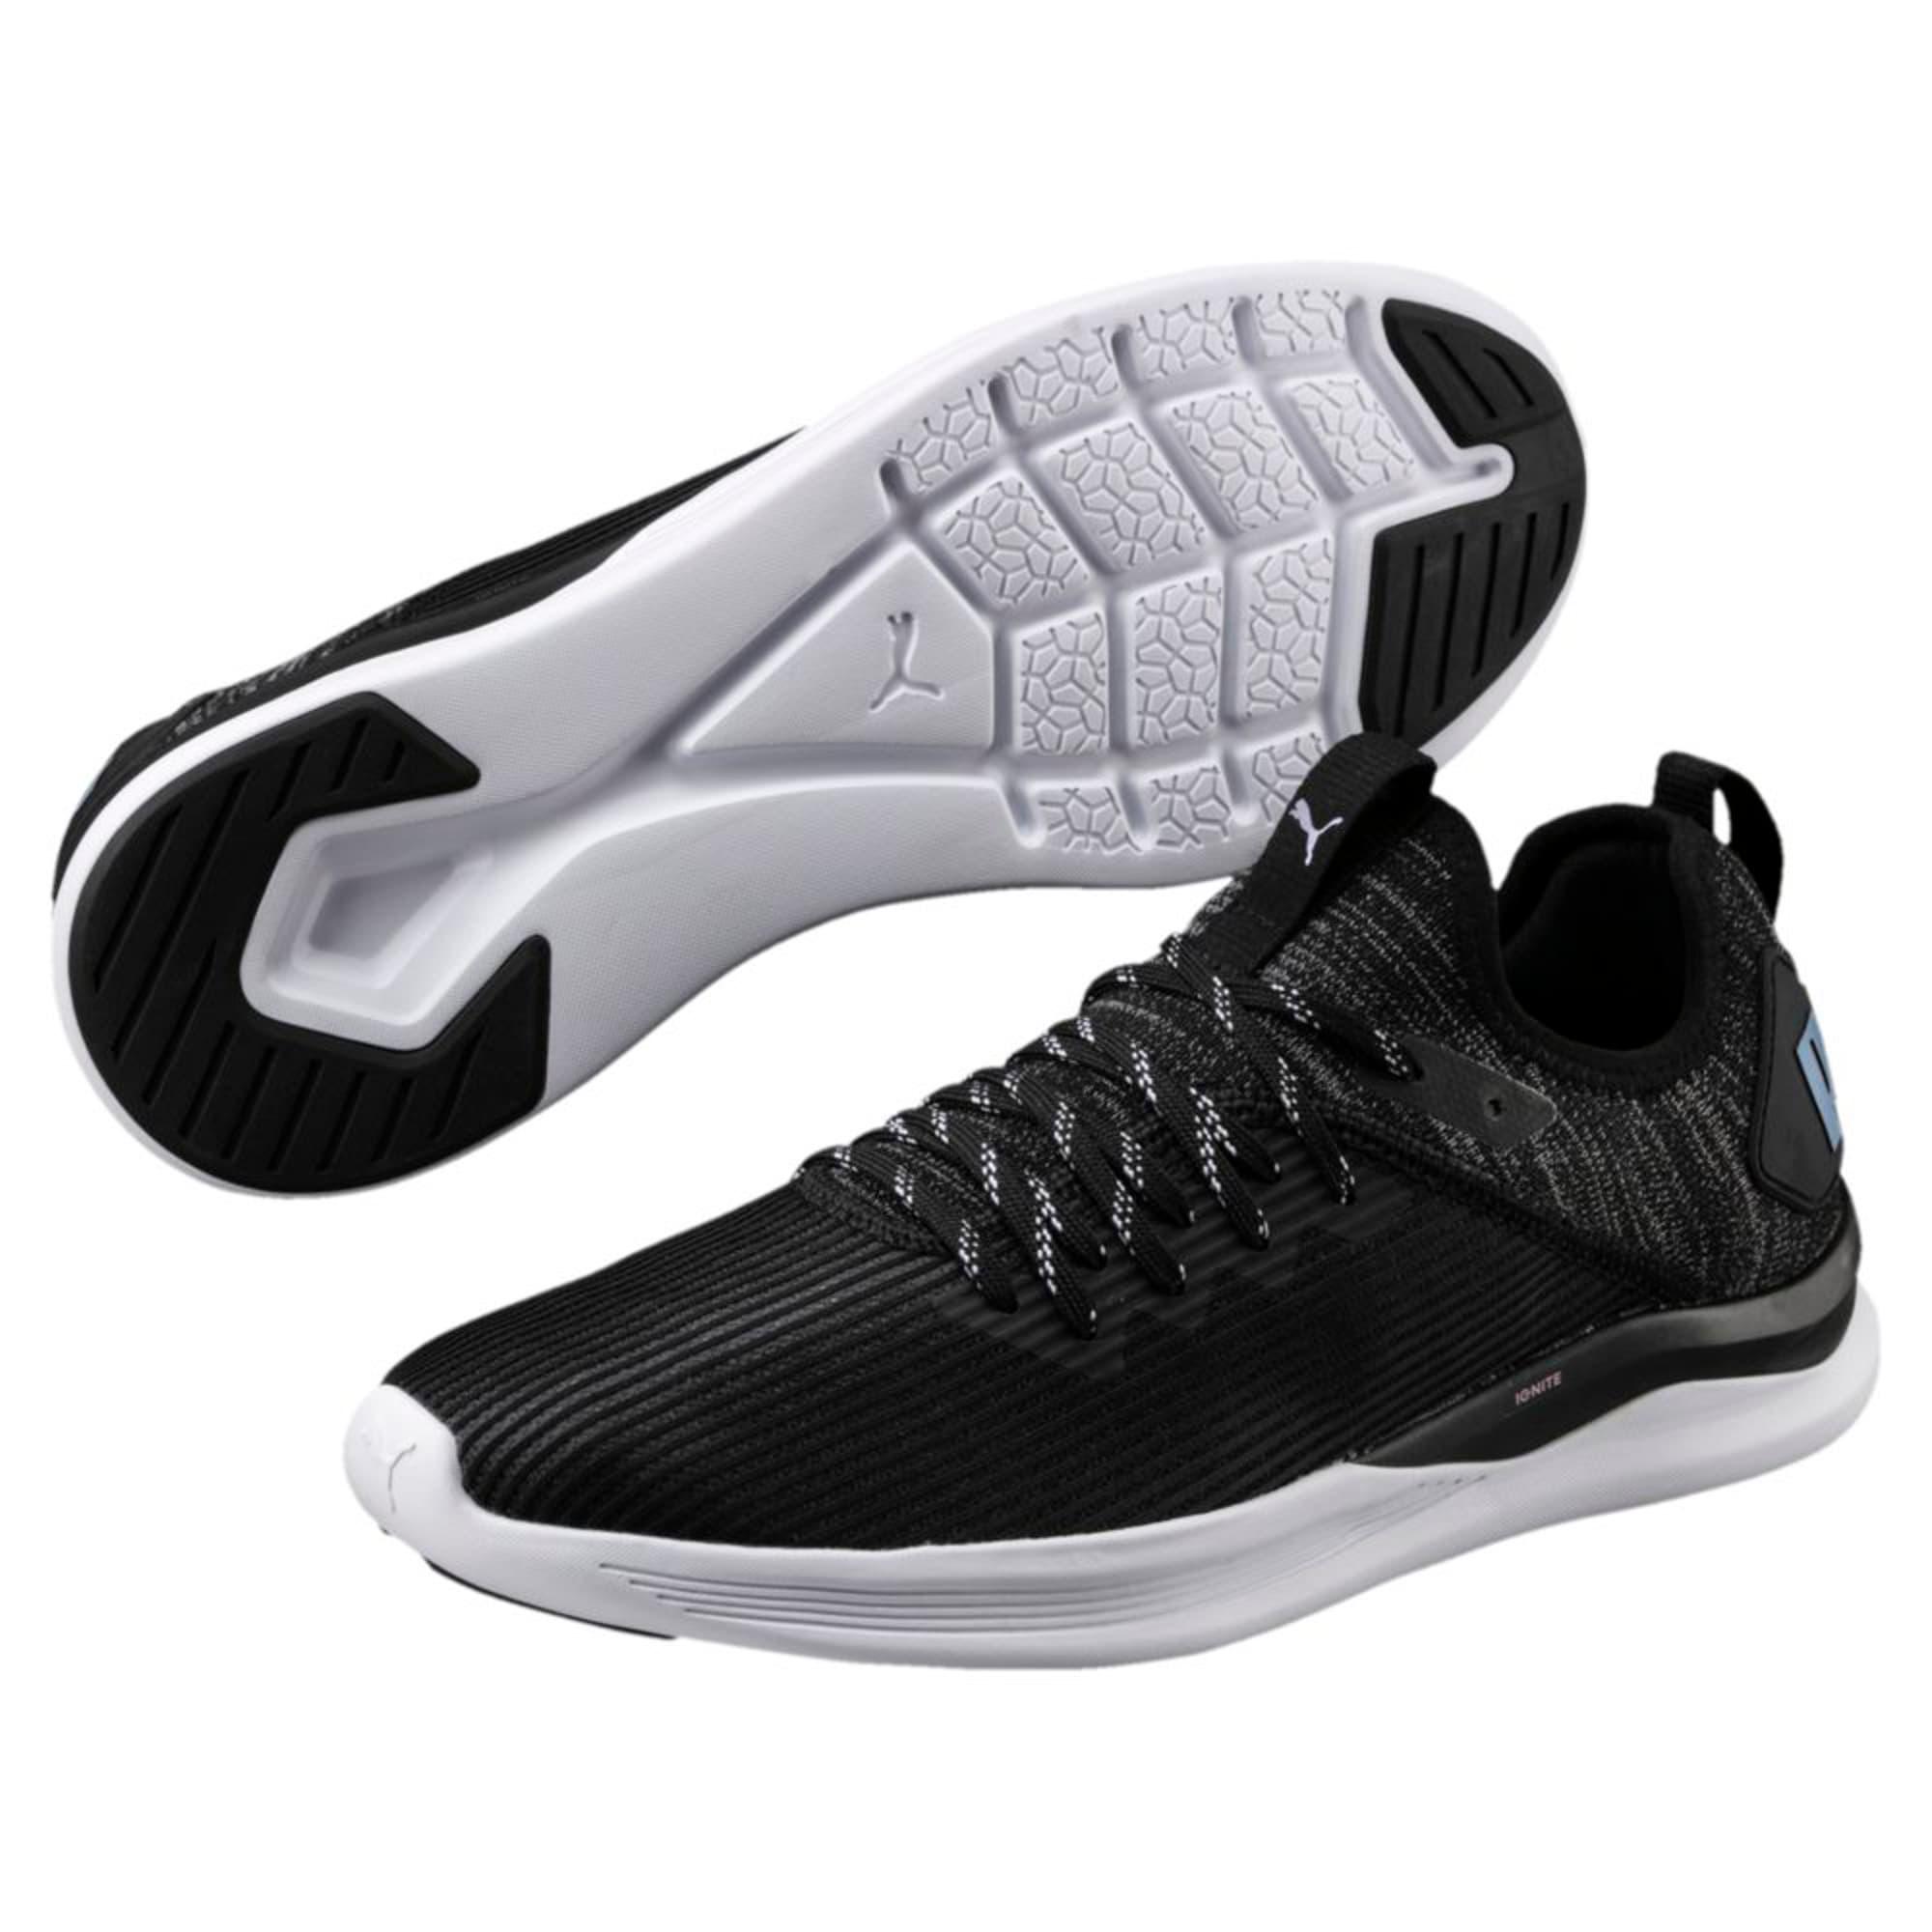 Thumbnail 6 of IGNITE Flash Stripped Men's Running Shoes, Puma Black-QUIET SHADE, medium-IND